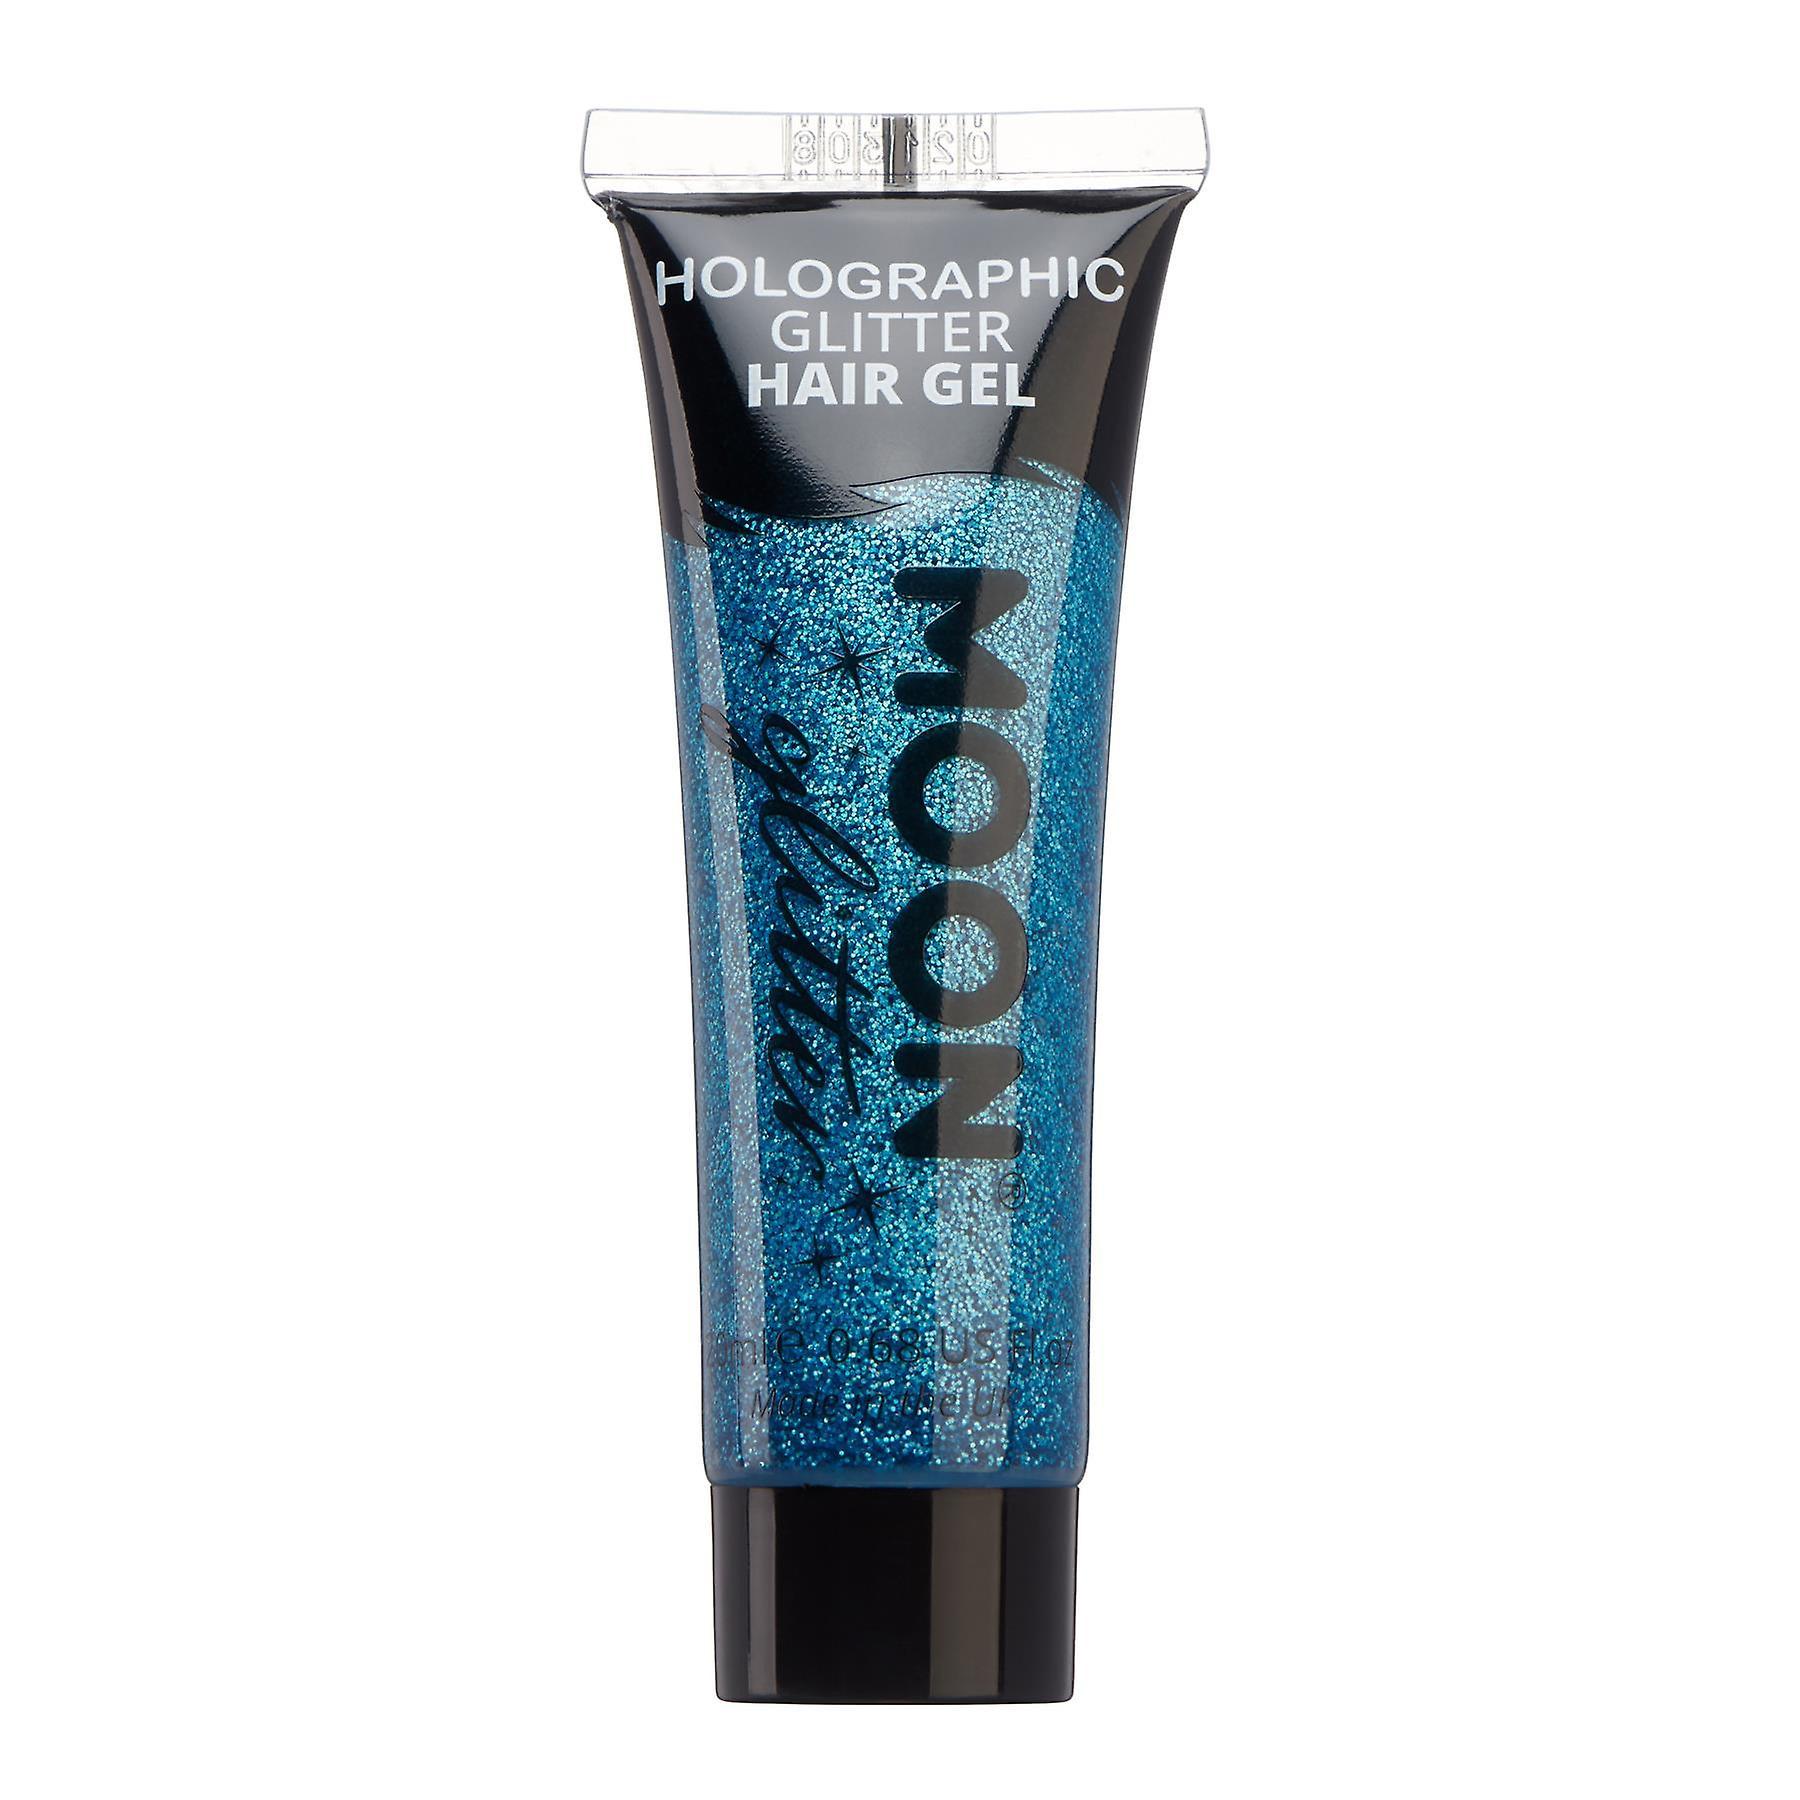 Holographic Glitter Hair Gel by Moon Glitter - 20ml - Blue